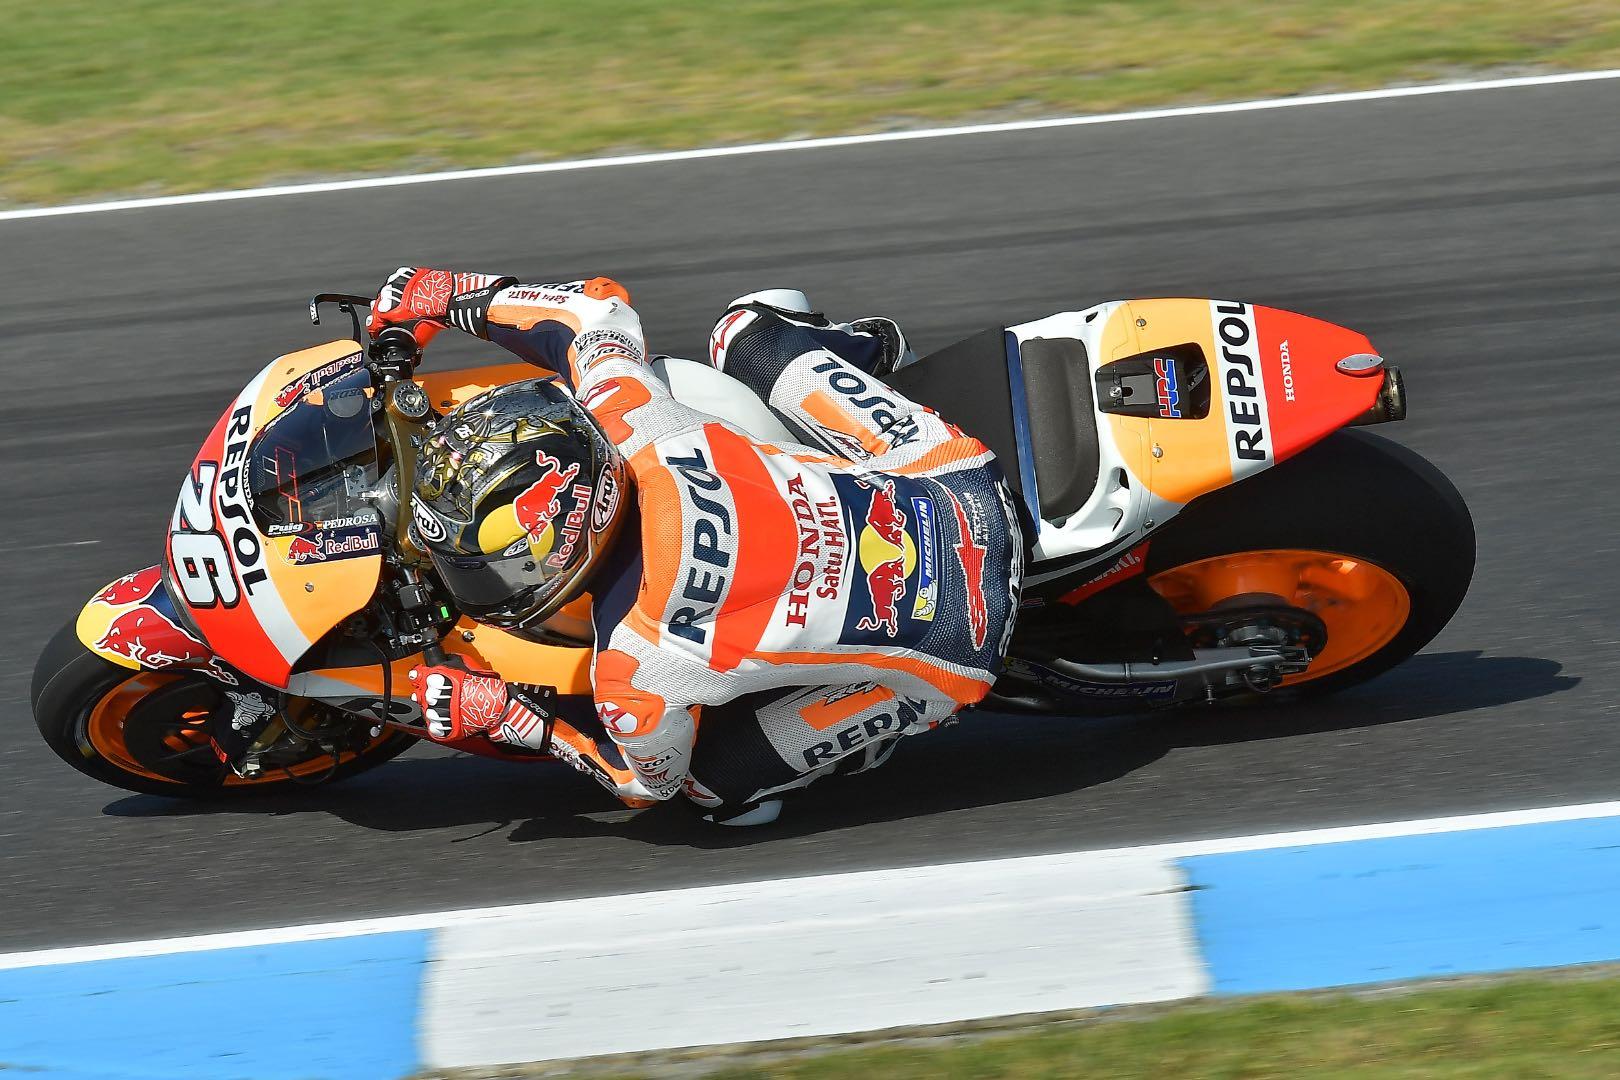 2017 Phillip Island MotoGP Test: Honda's Dani Pedrosa